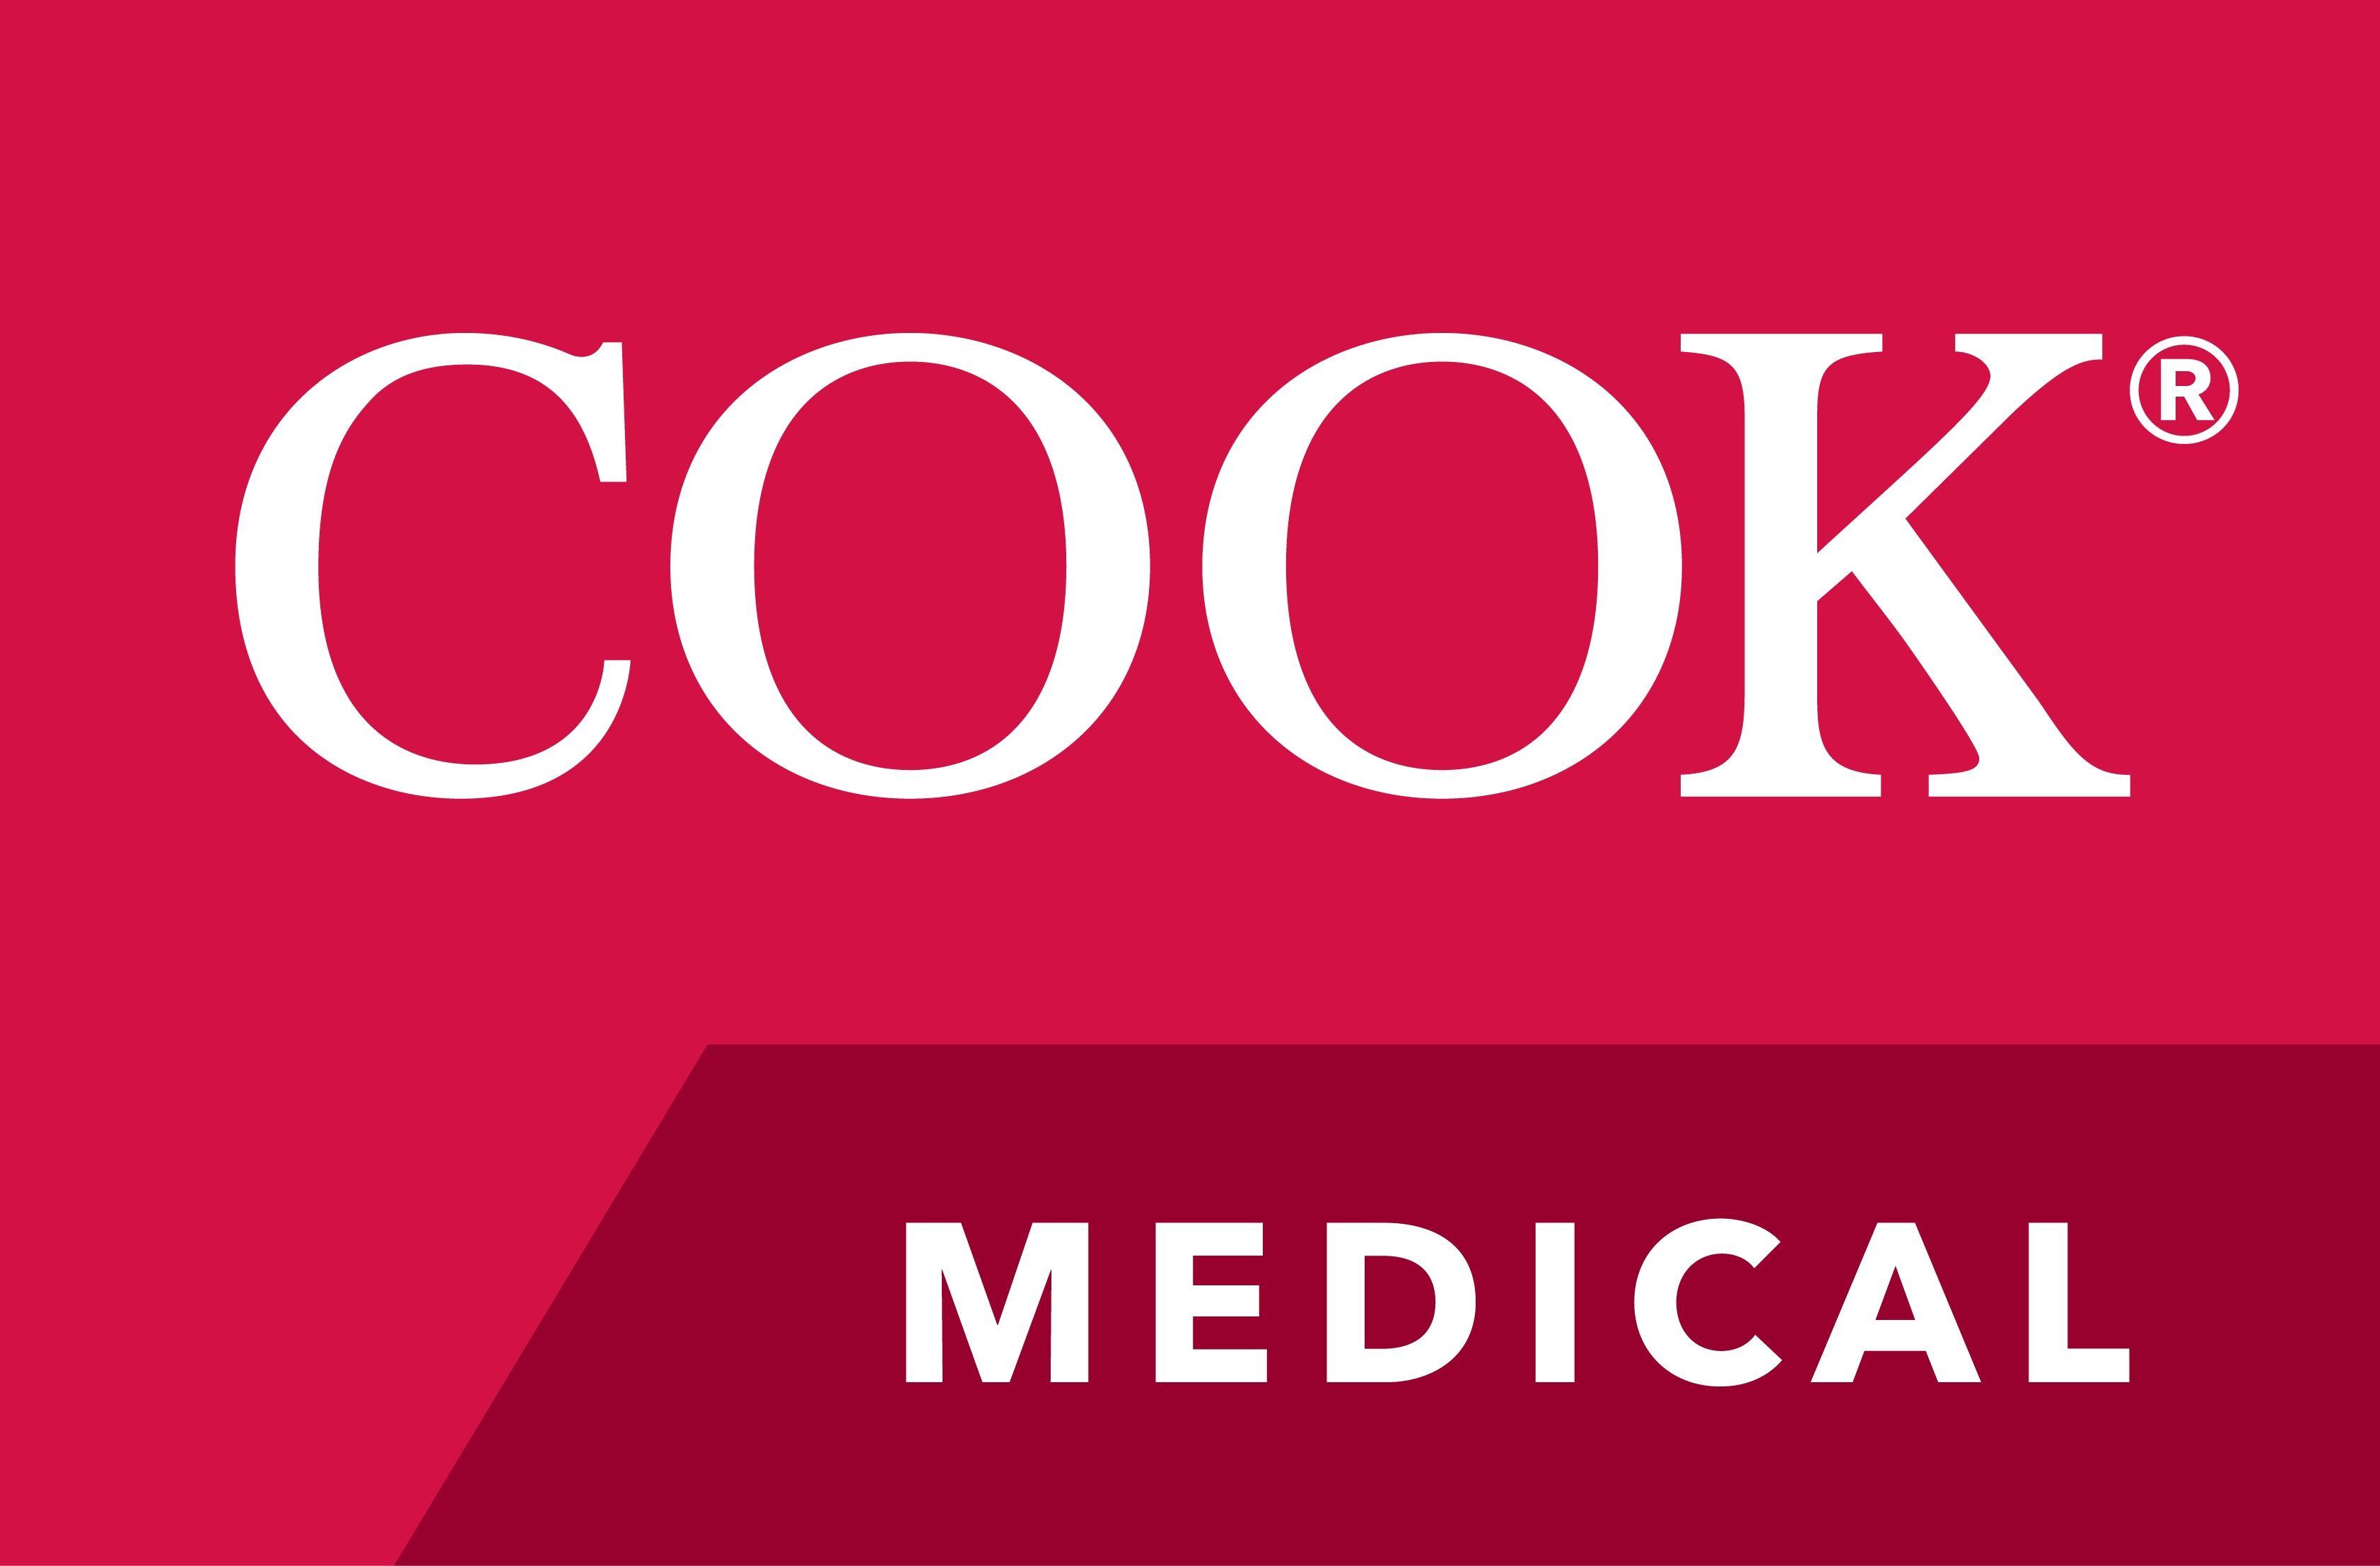 Cook Medical